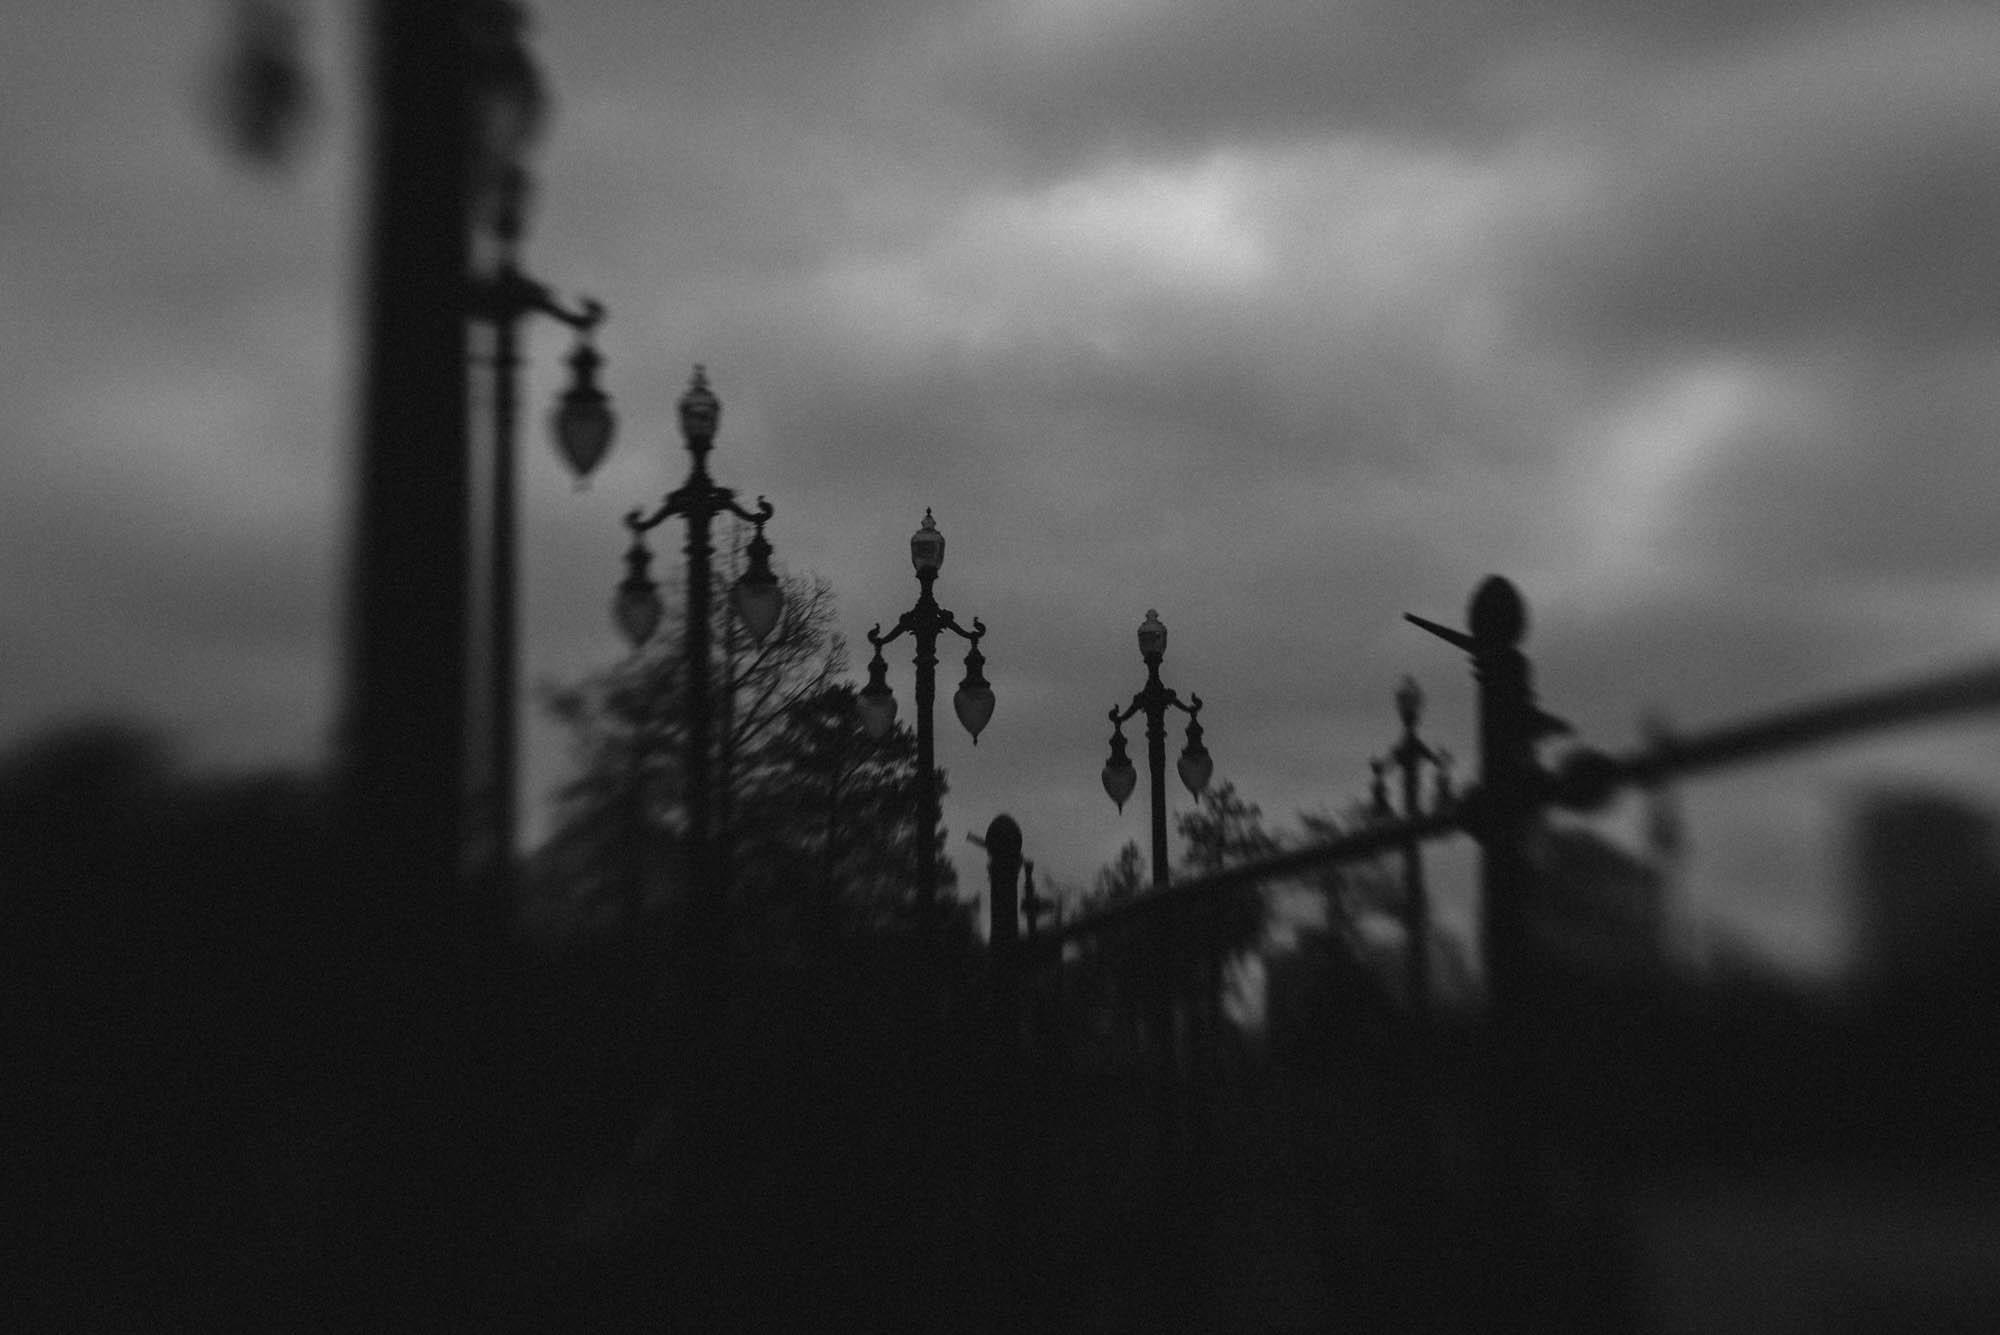 Carlos_Detres_Photography_Brugal_ForWeb_20150314_0617.jpg